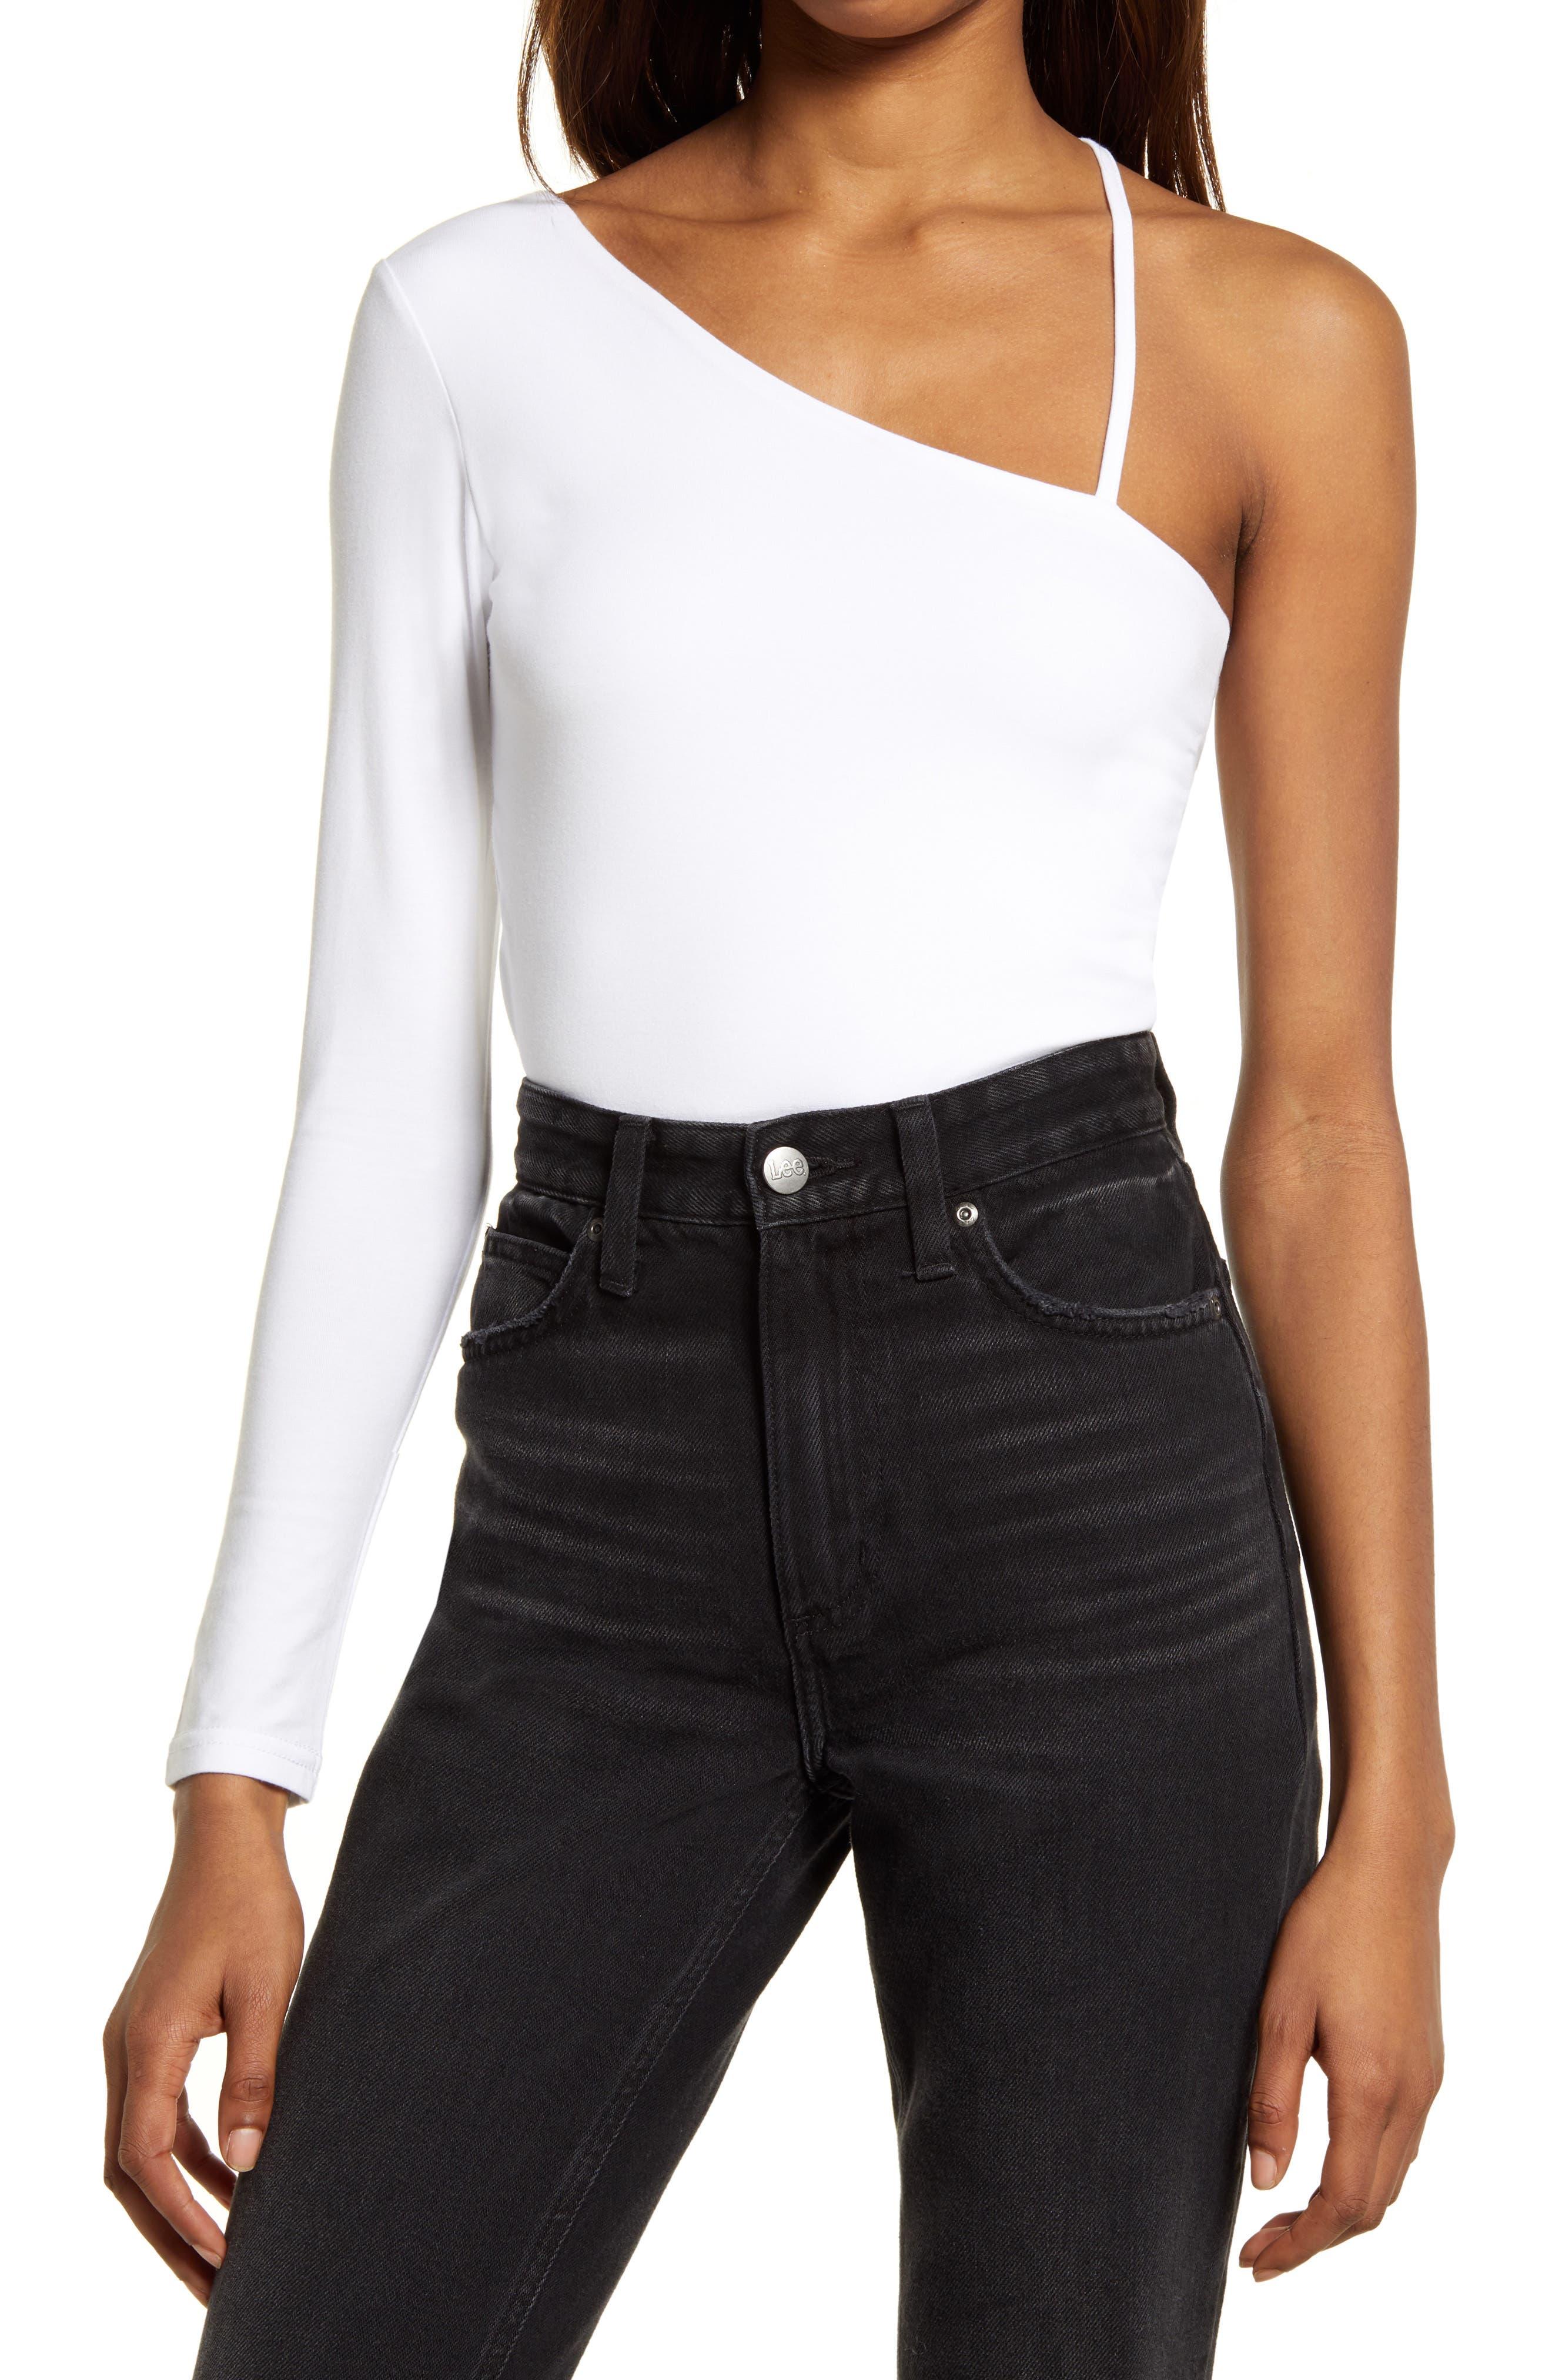 One-Shoulder Long Sleeve Bodysuit